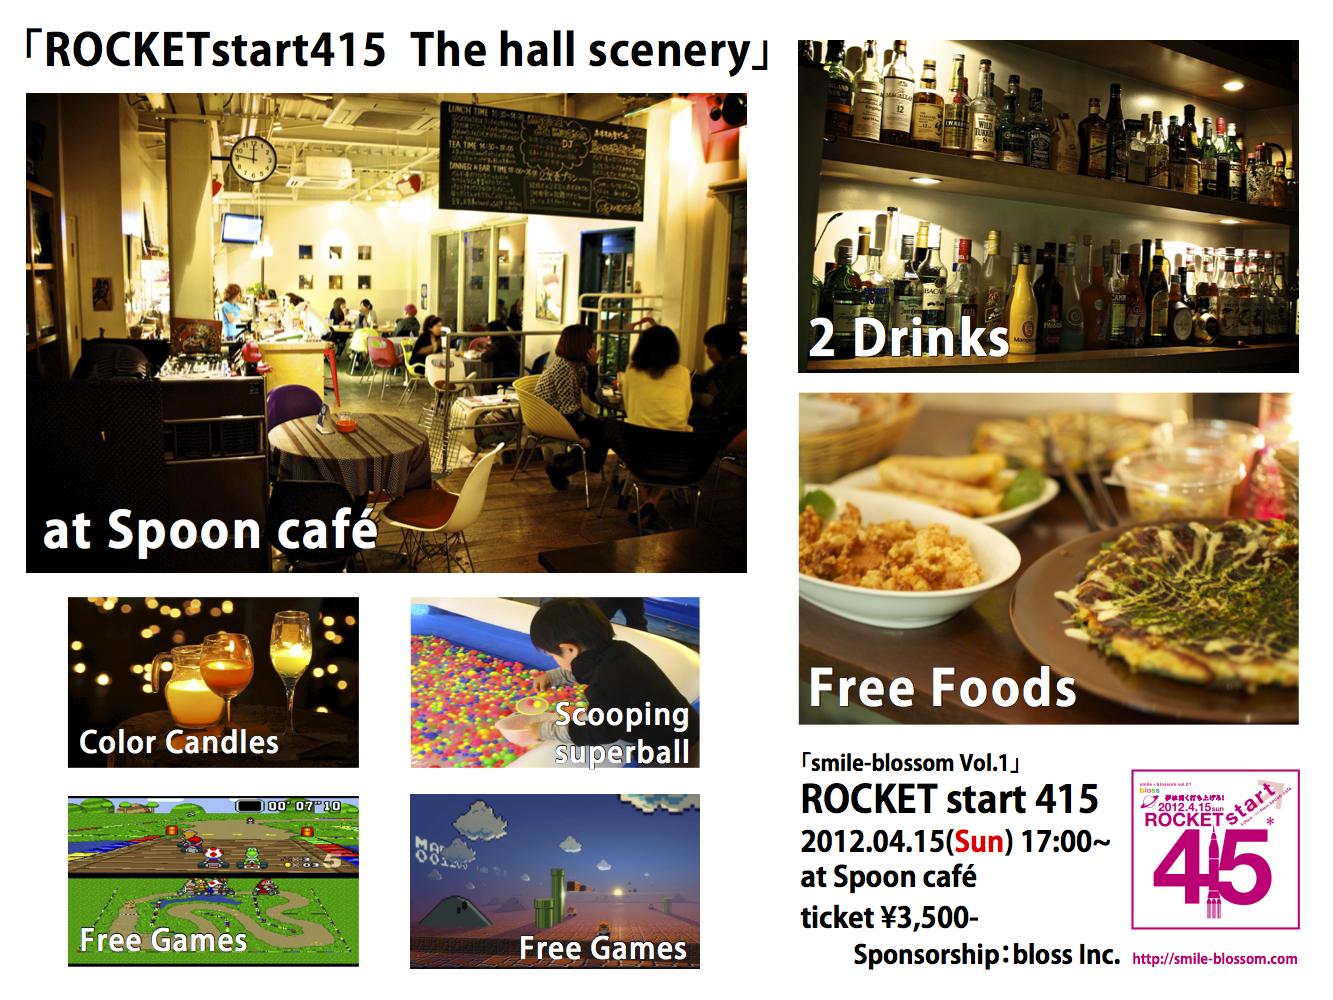 ROCKETstart415 情報 Vol.4 ~会場風景情報~